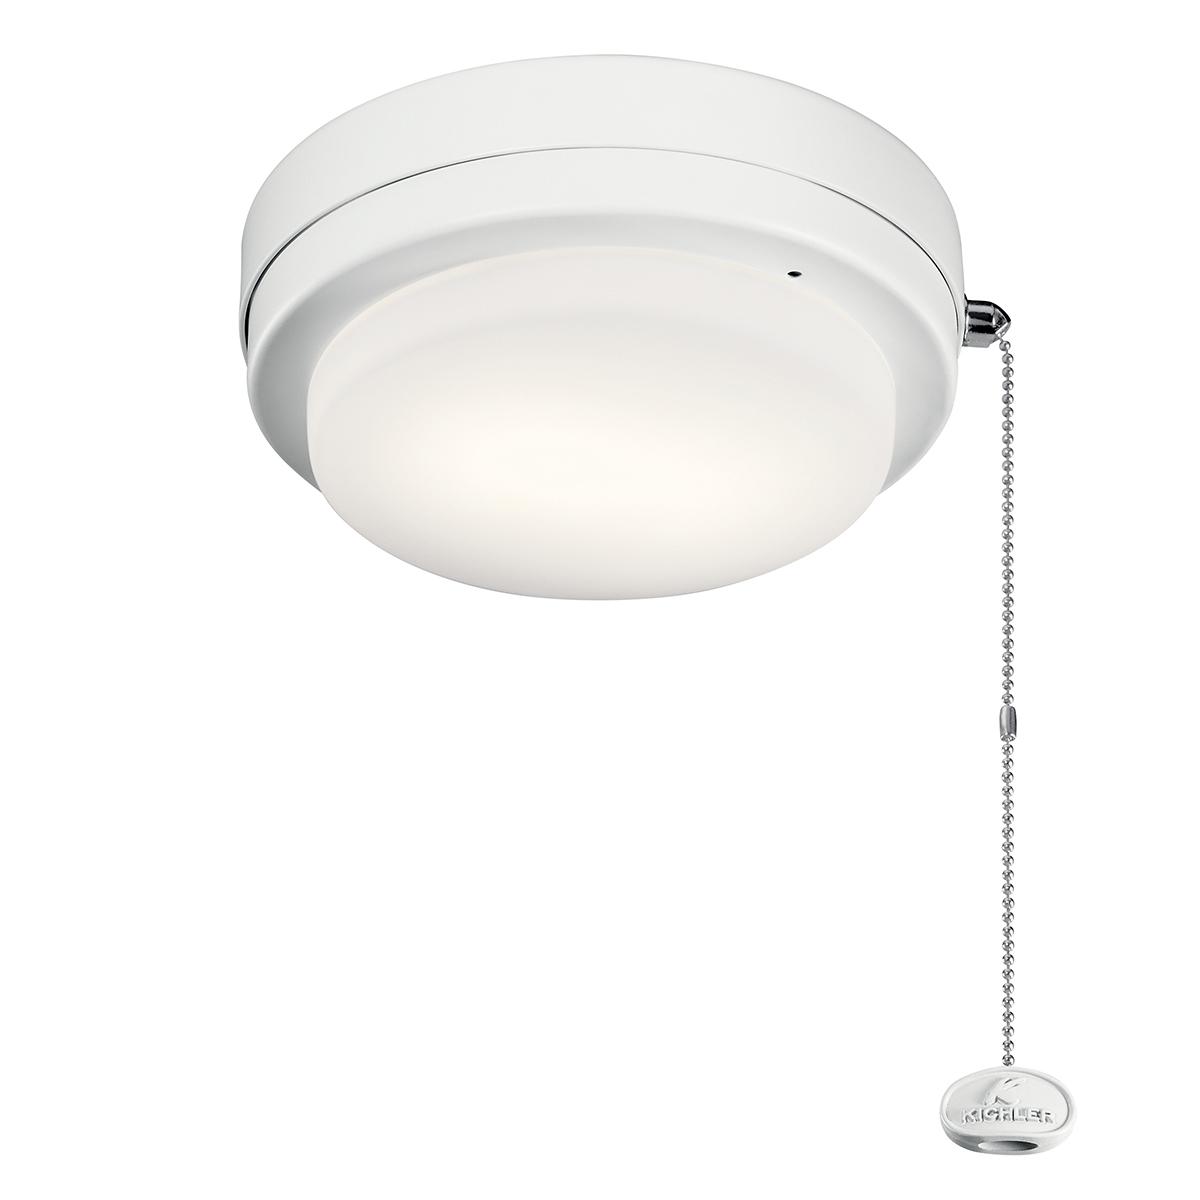 Optional LED Climates Fixture